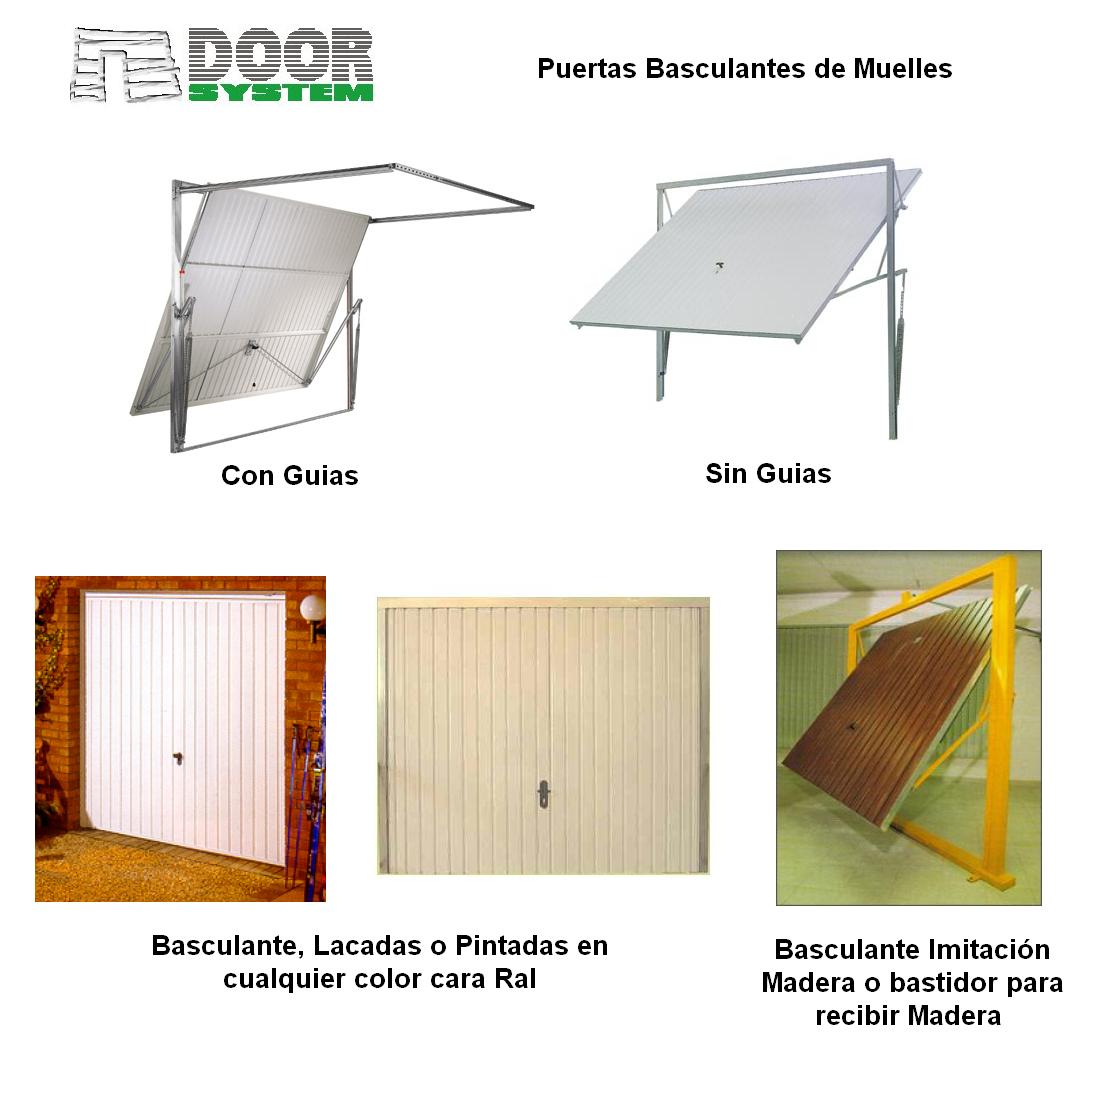 Puertas Basculantes Valencia - Door System S.L.